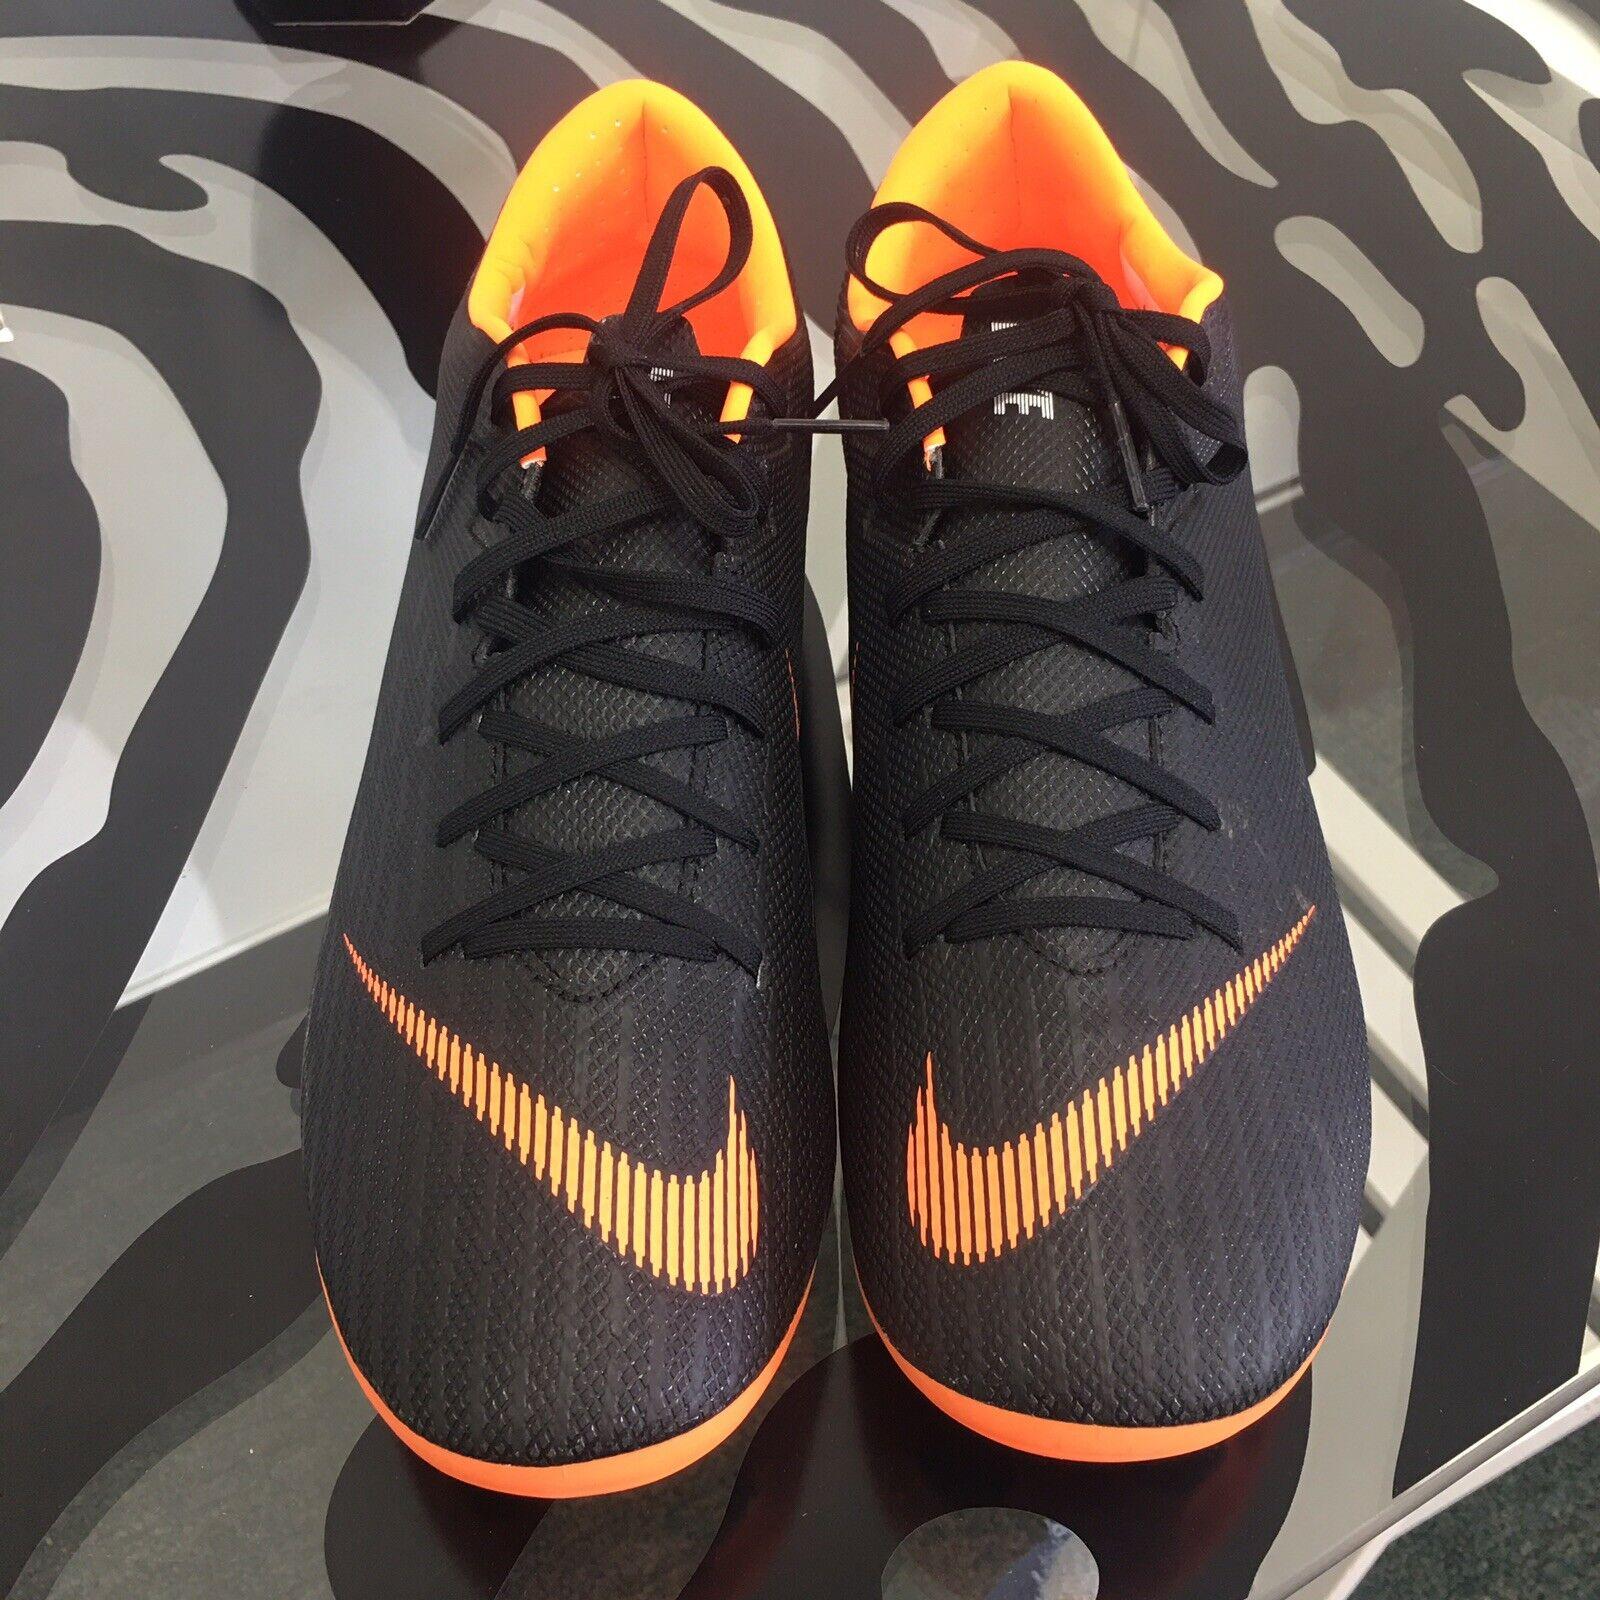 Brand New Nike Mercurial Xlll 12 12 12 Pro FG Soccer Cleats Dimensione 8.5 4ac042